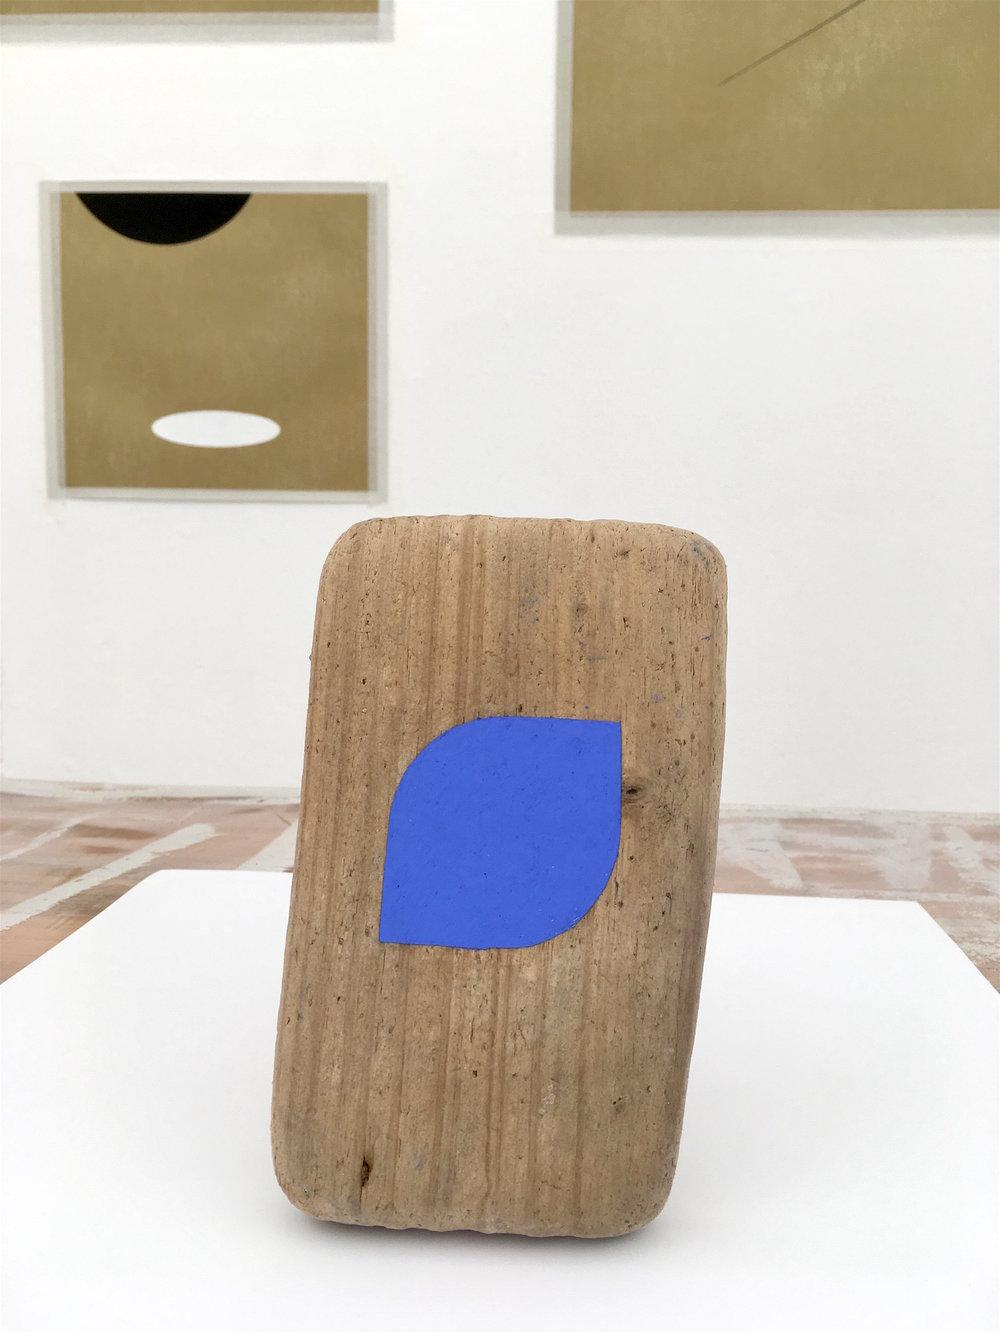 Blue seashell (Estudio del silencio),  2017 / Oil pastel on driftwood / 20cm x 12cm